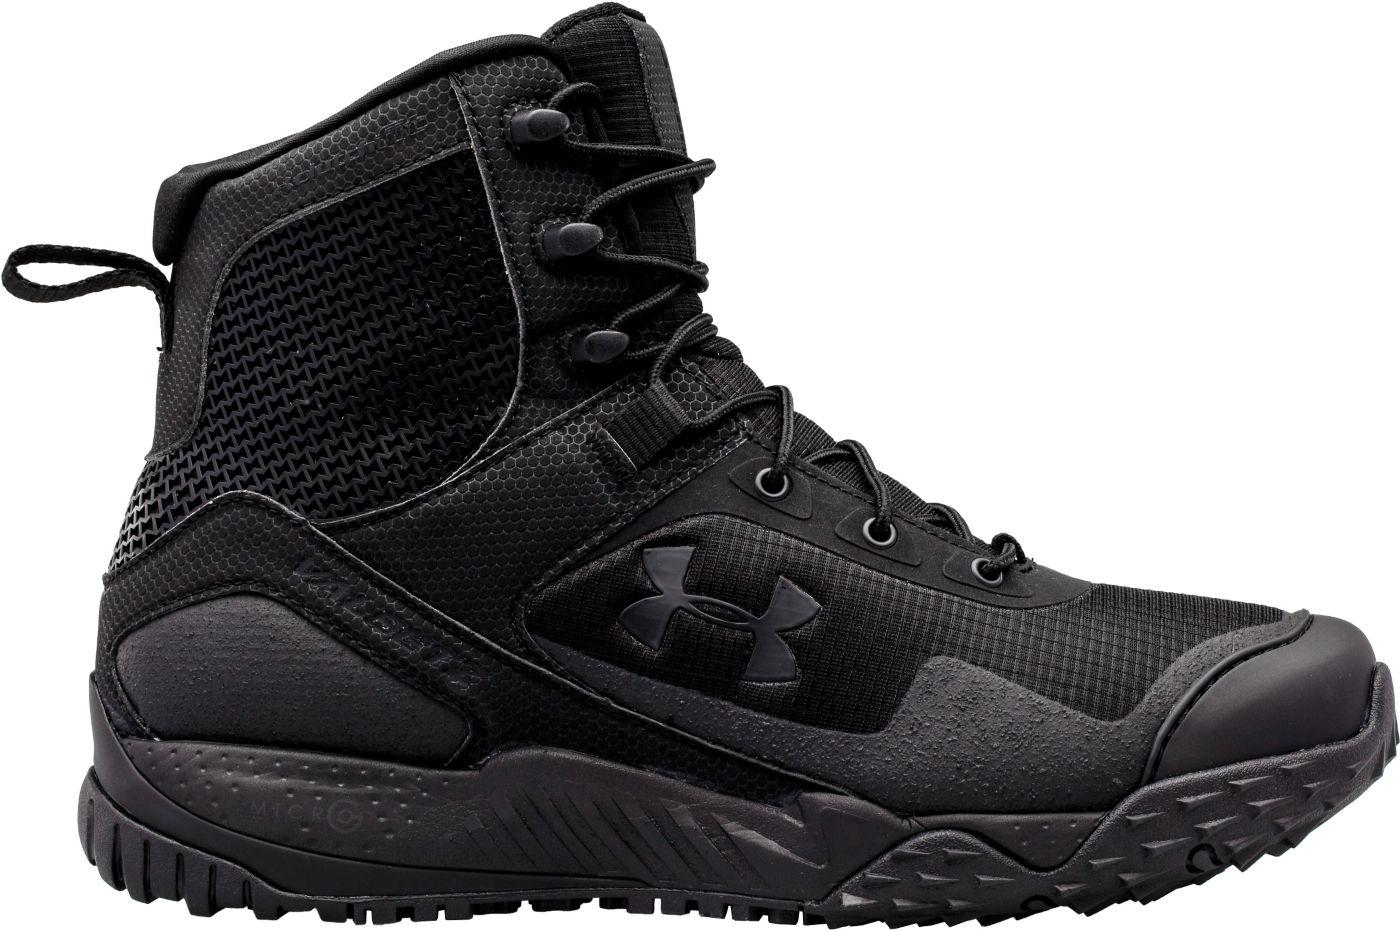 Under Armour Men's Valsetz RTS Side-Zip Tactical Boots